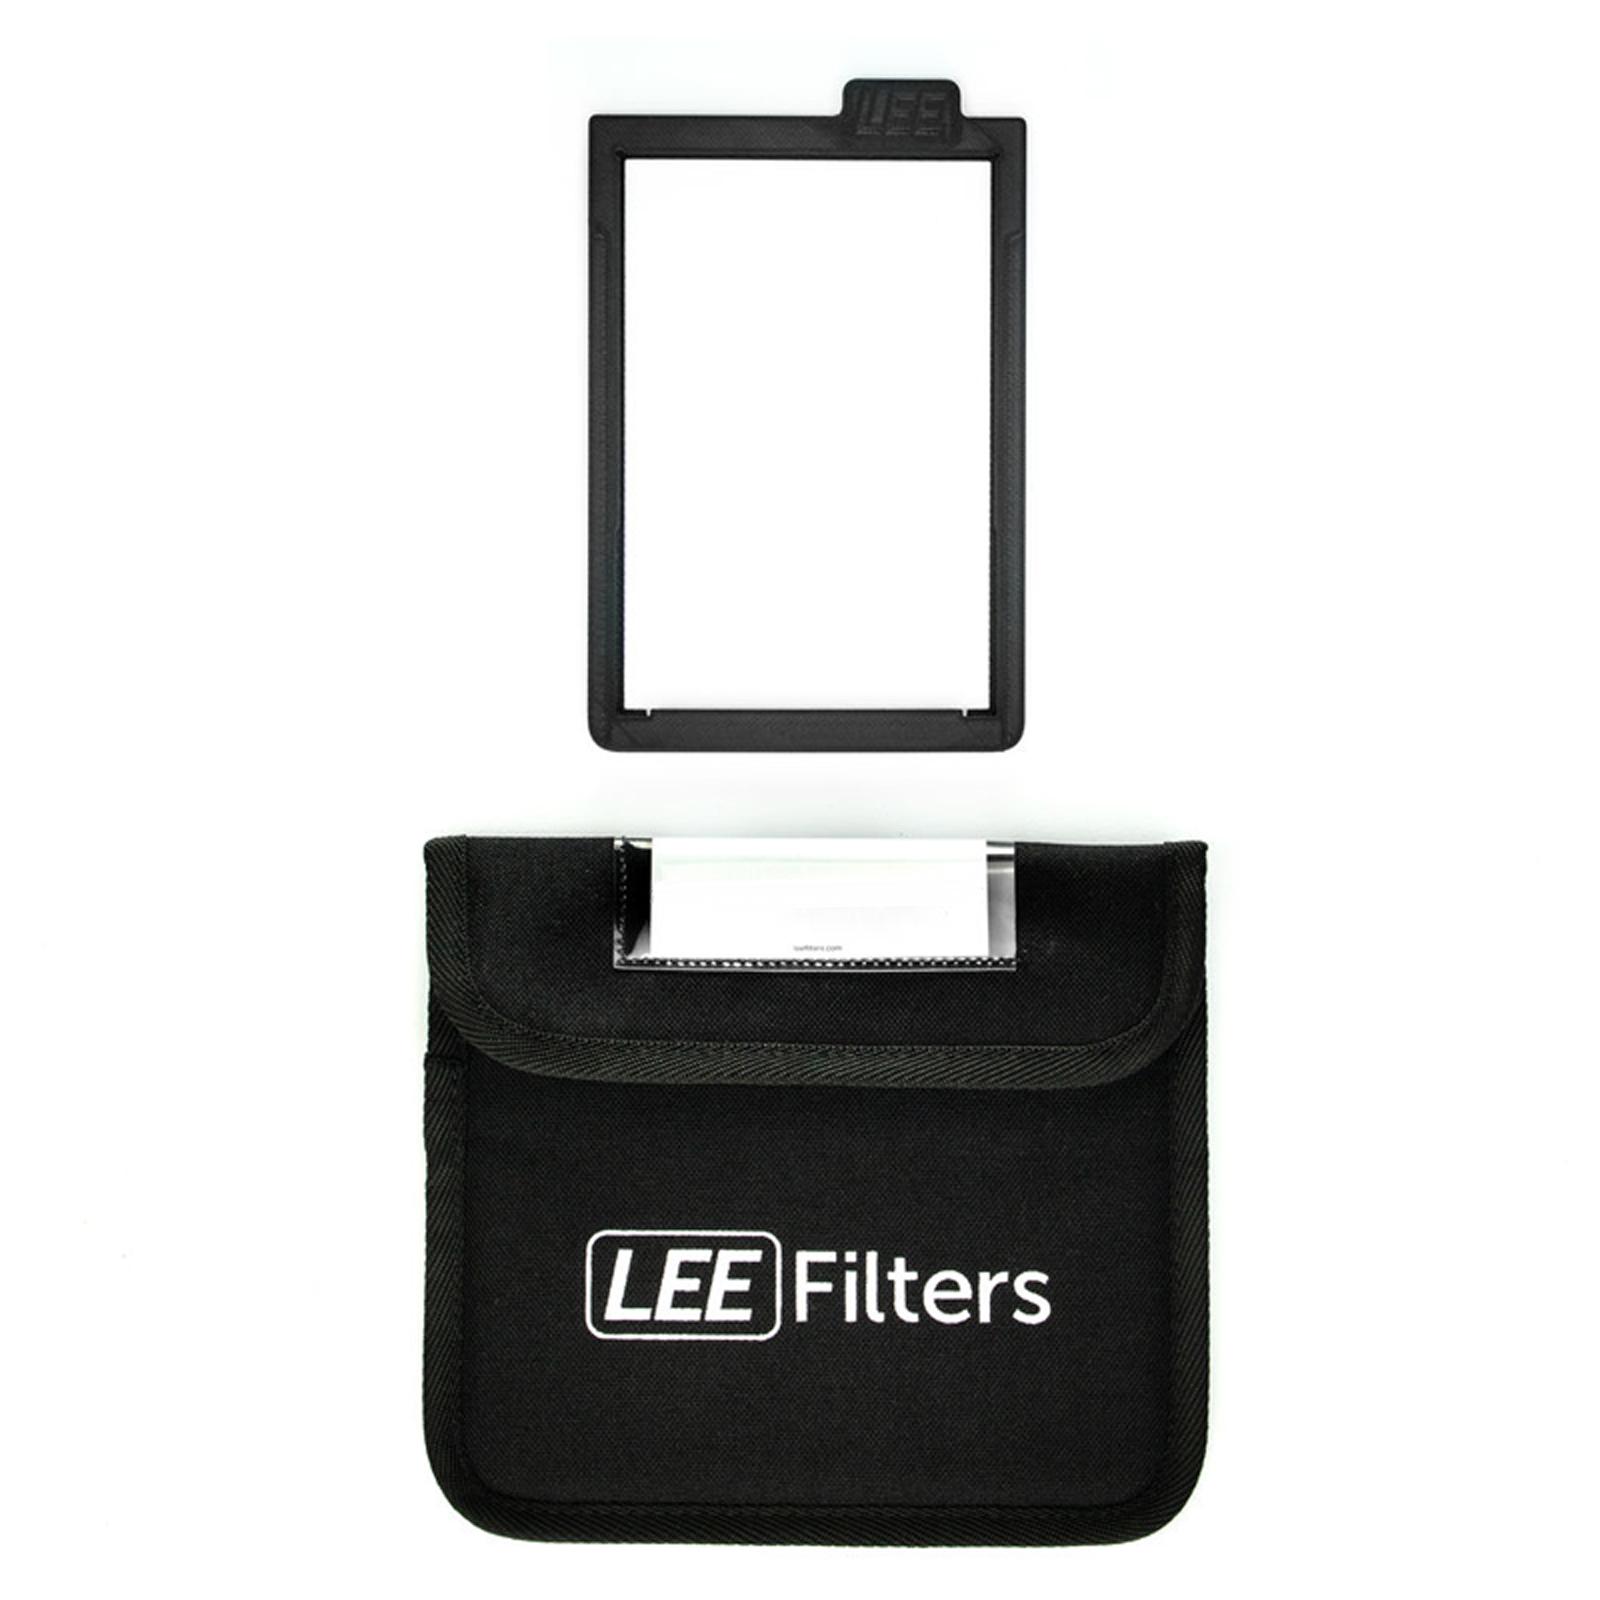 100x150mm-Filter-Frame